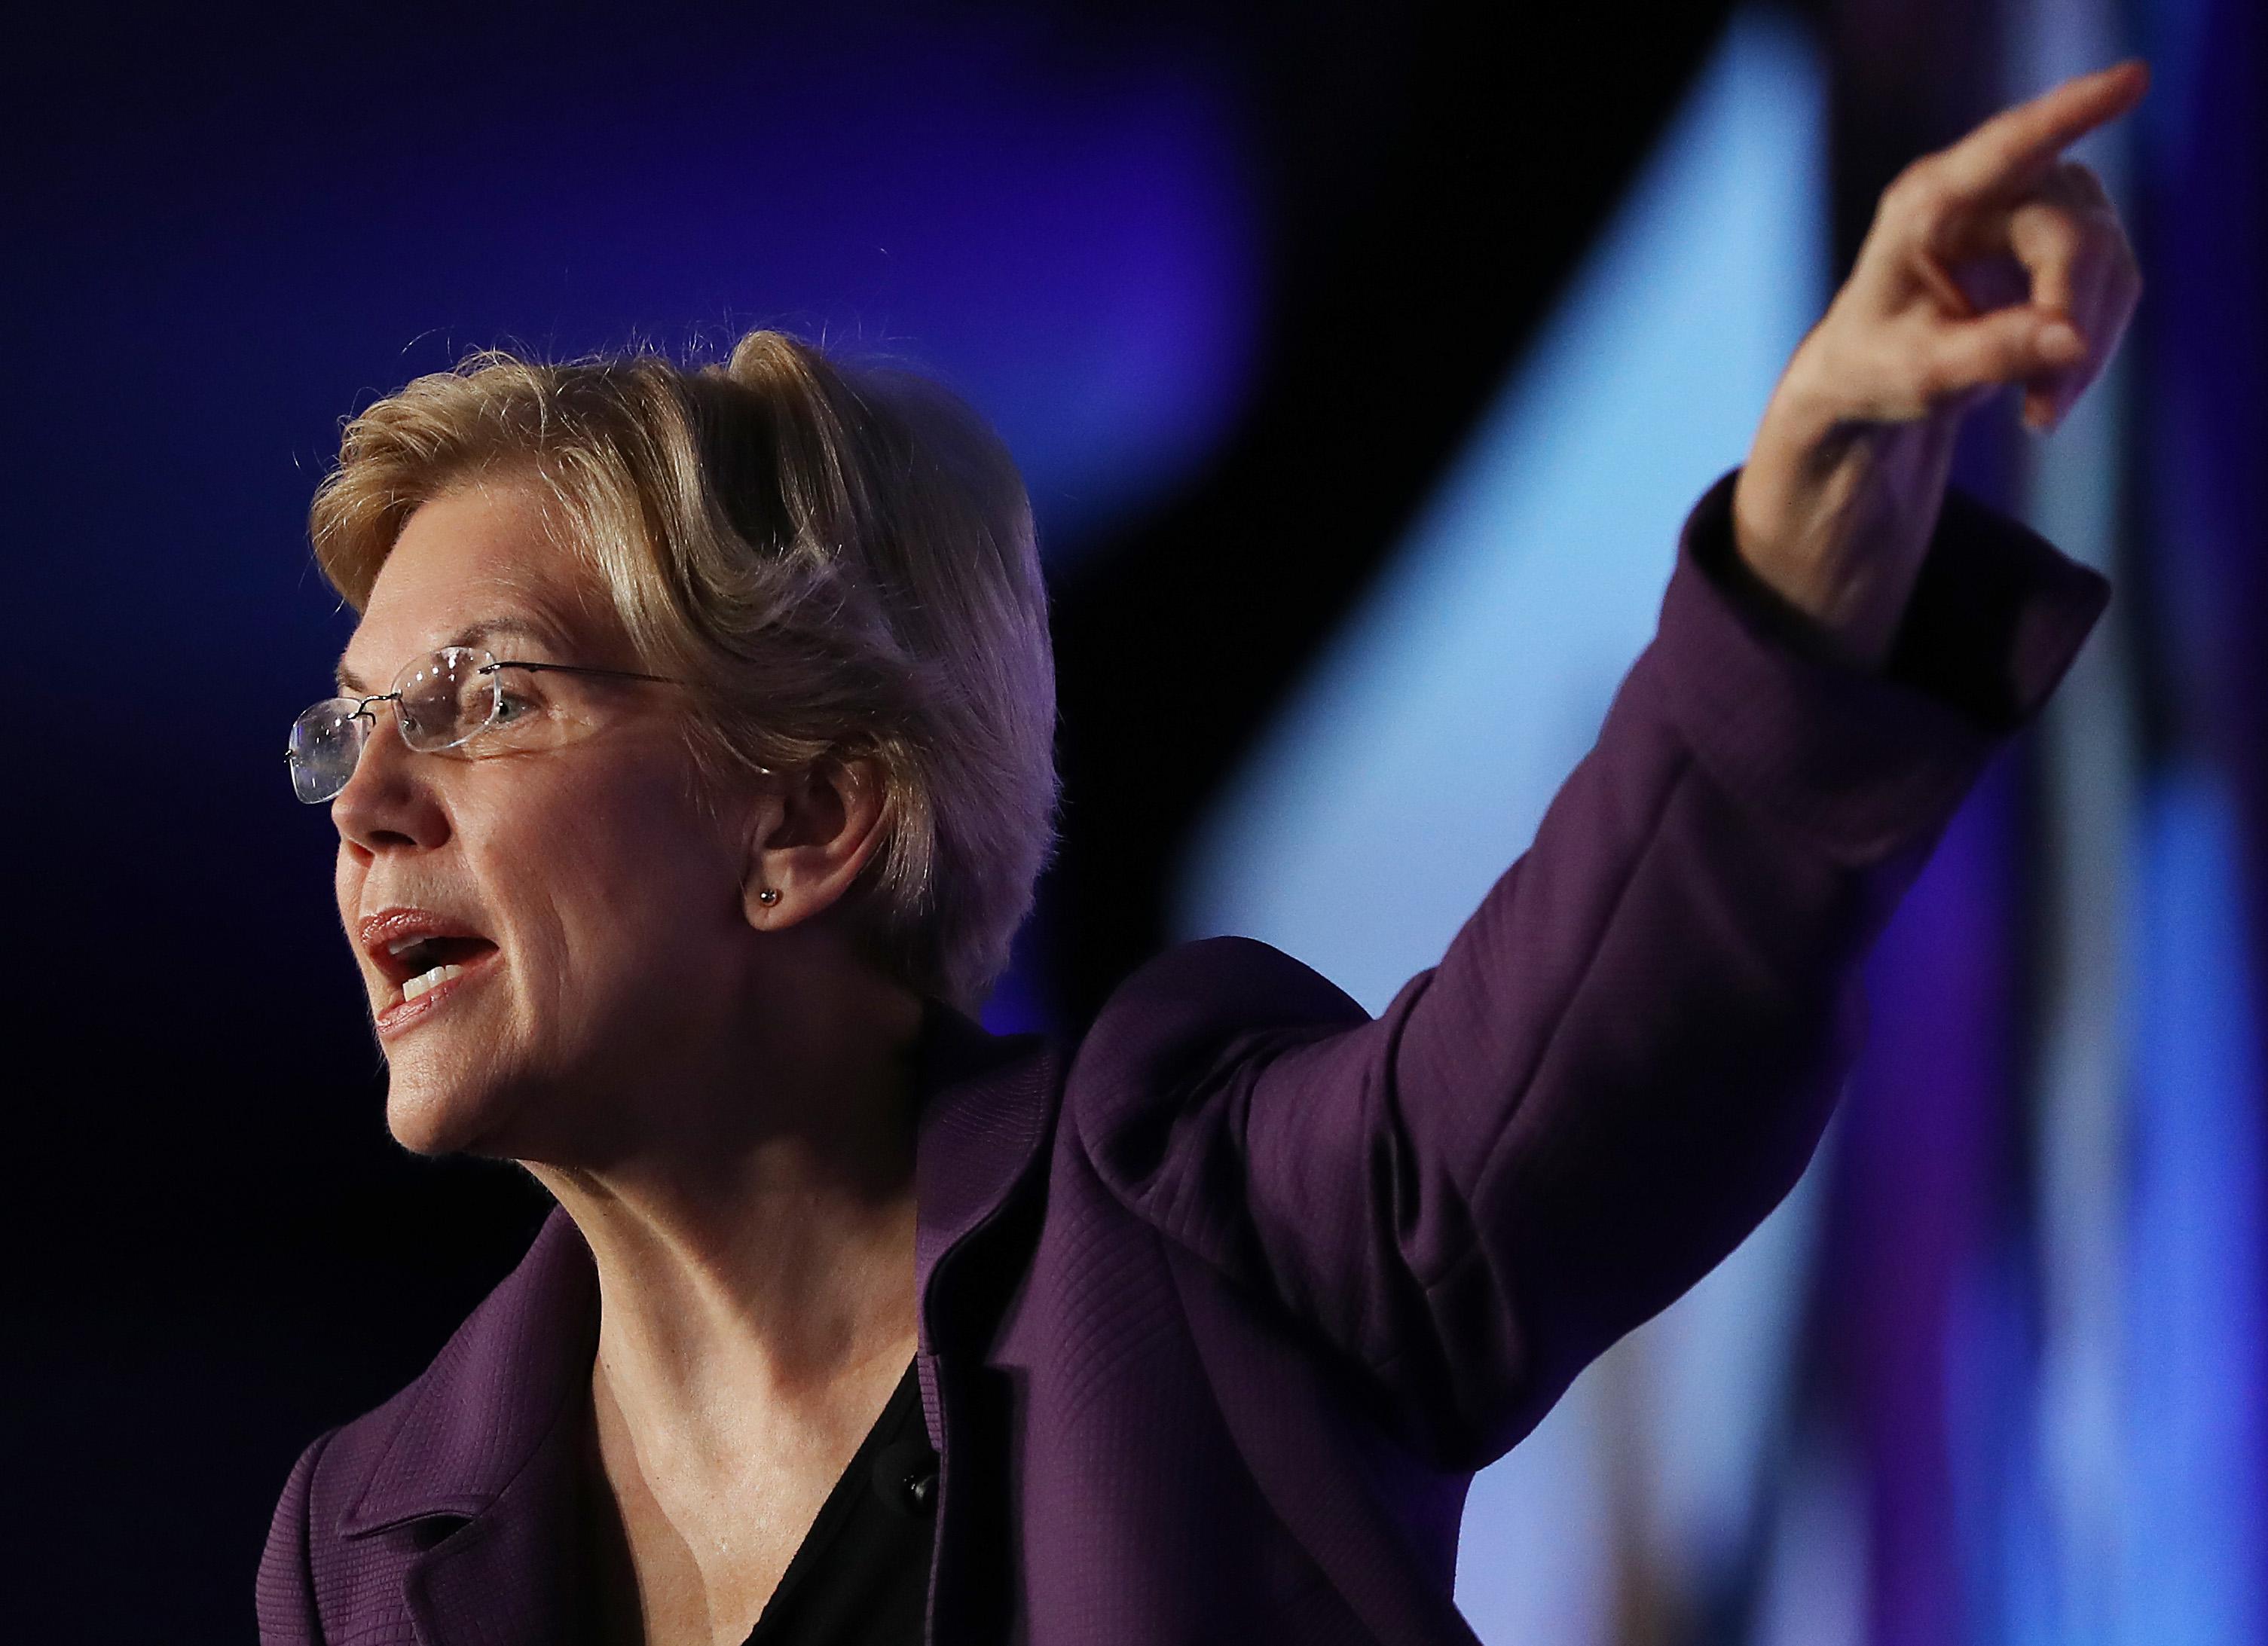 Senator Elizabeth Warren speaking and pointing from onstage.